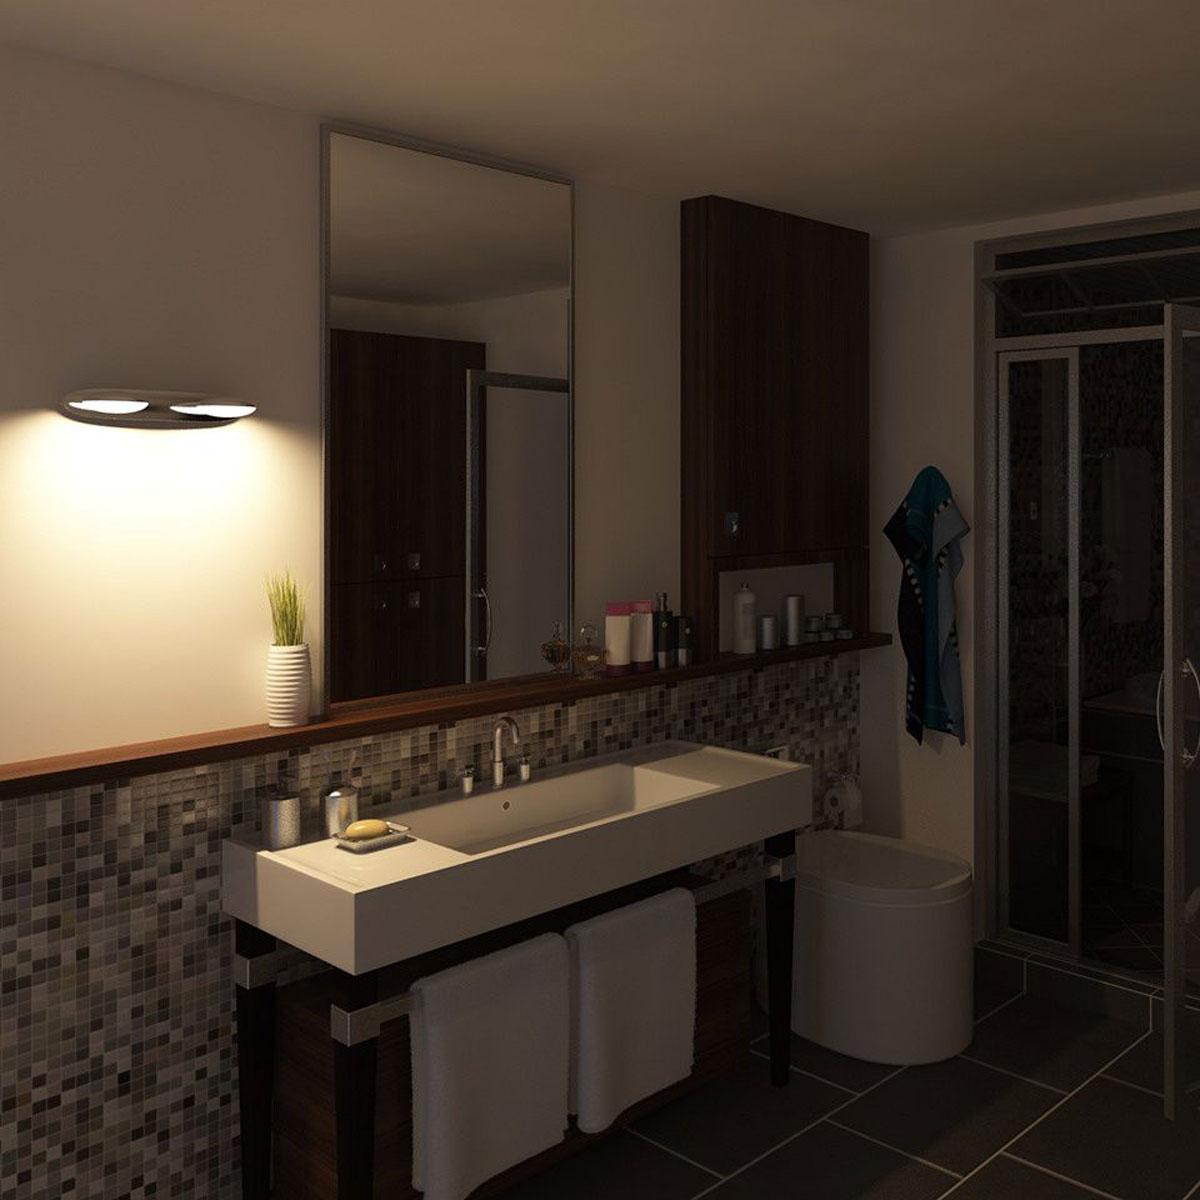 philips mybathroom hotstone wandlamp chroom 2 lampen. Black Bedroom Furniture Sets. Home Design Ideas